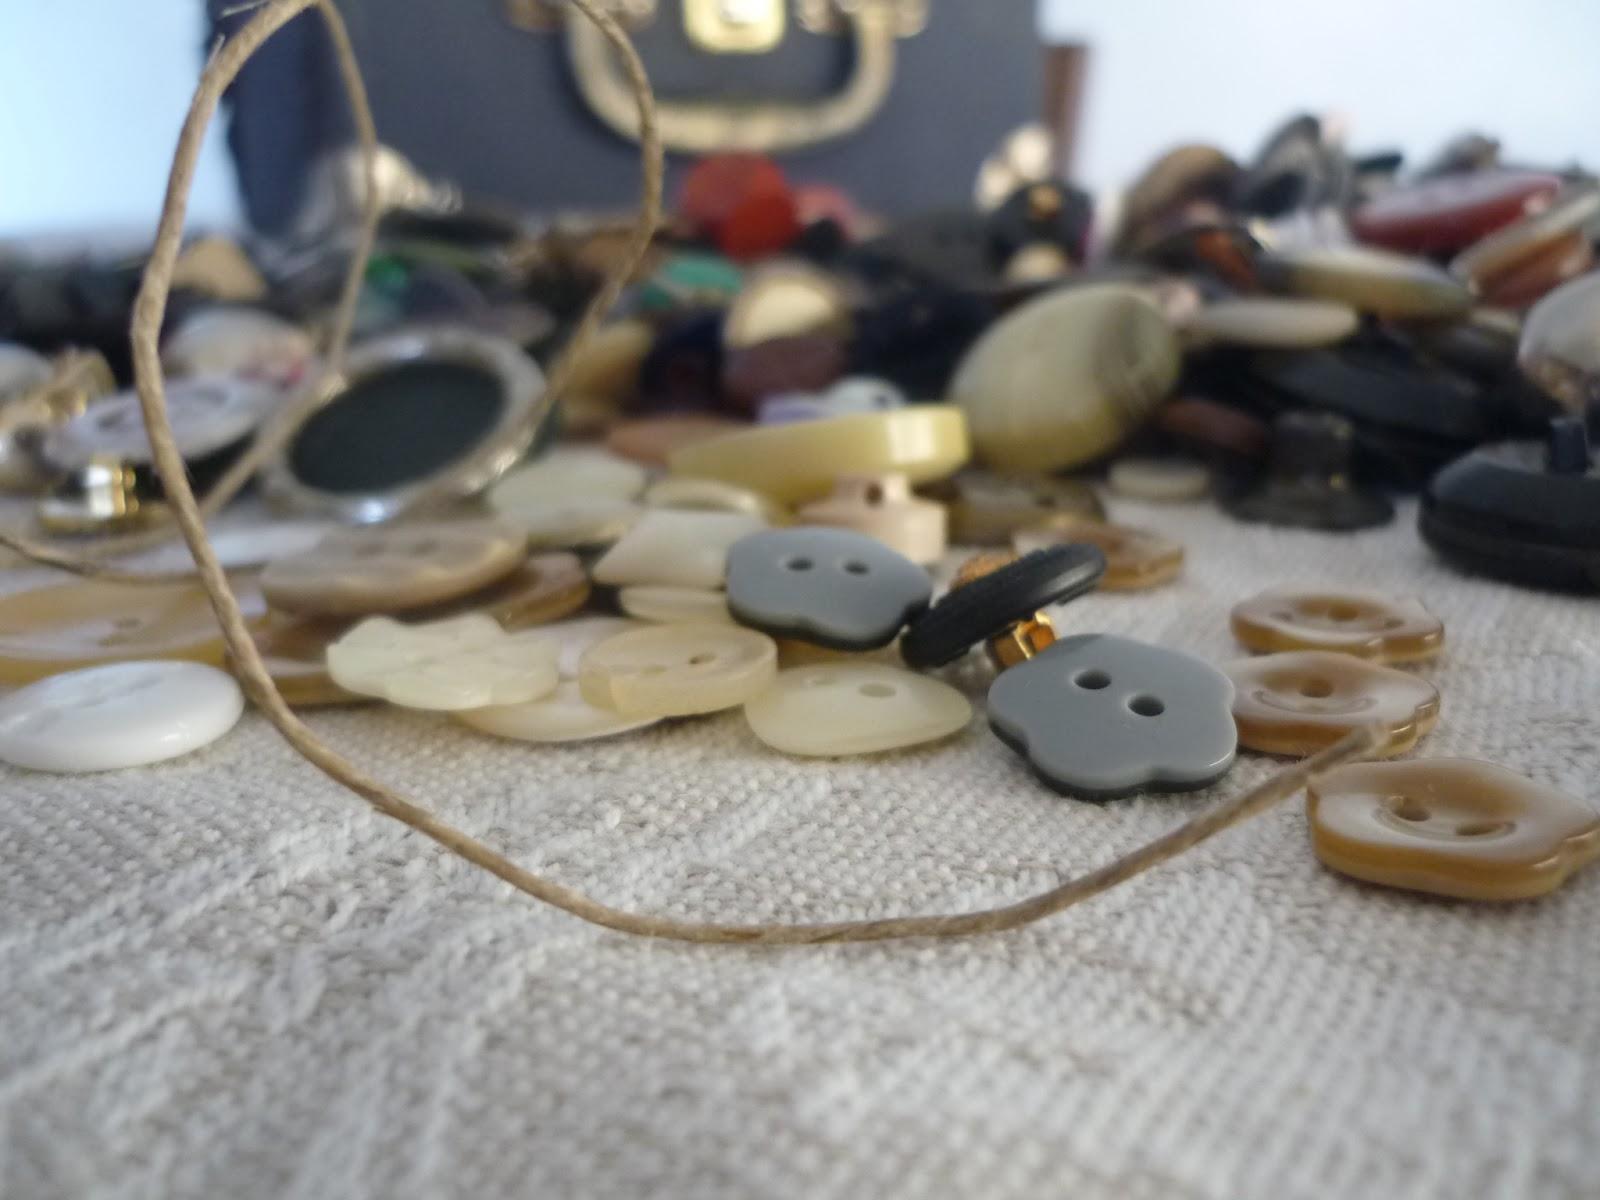 Matrimonio Country Chic Catania : Segnaposto bottoni vintage shabby country chic fai da te